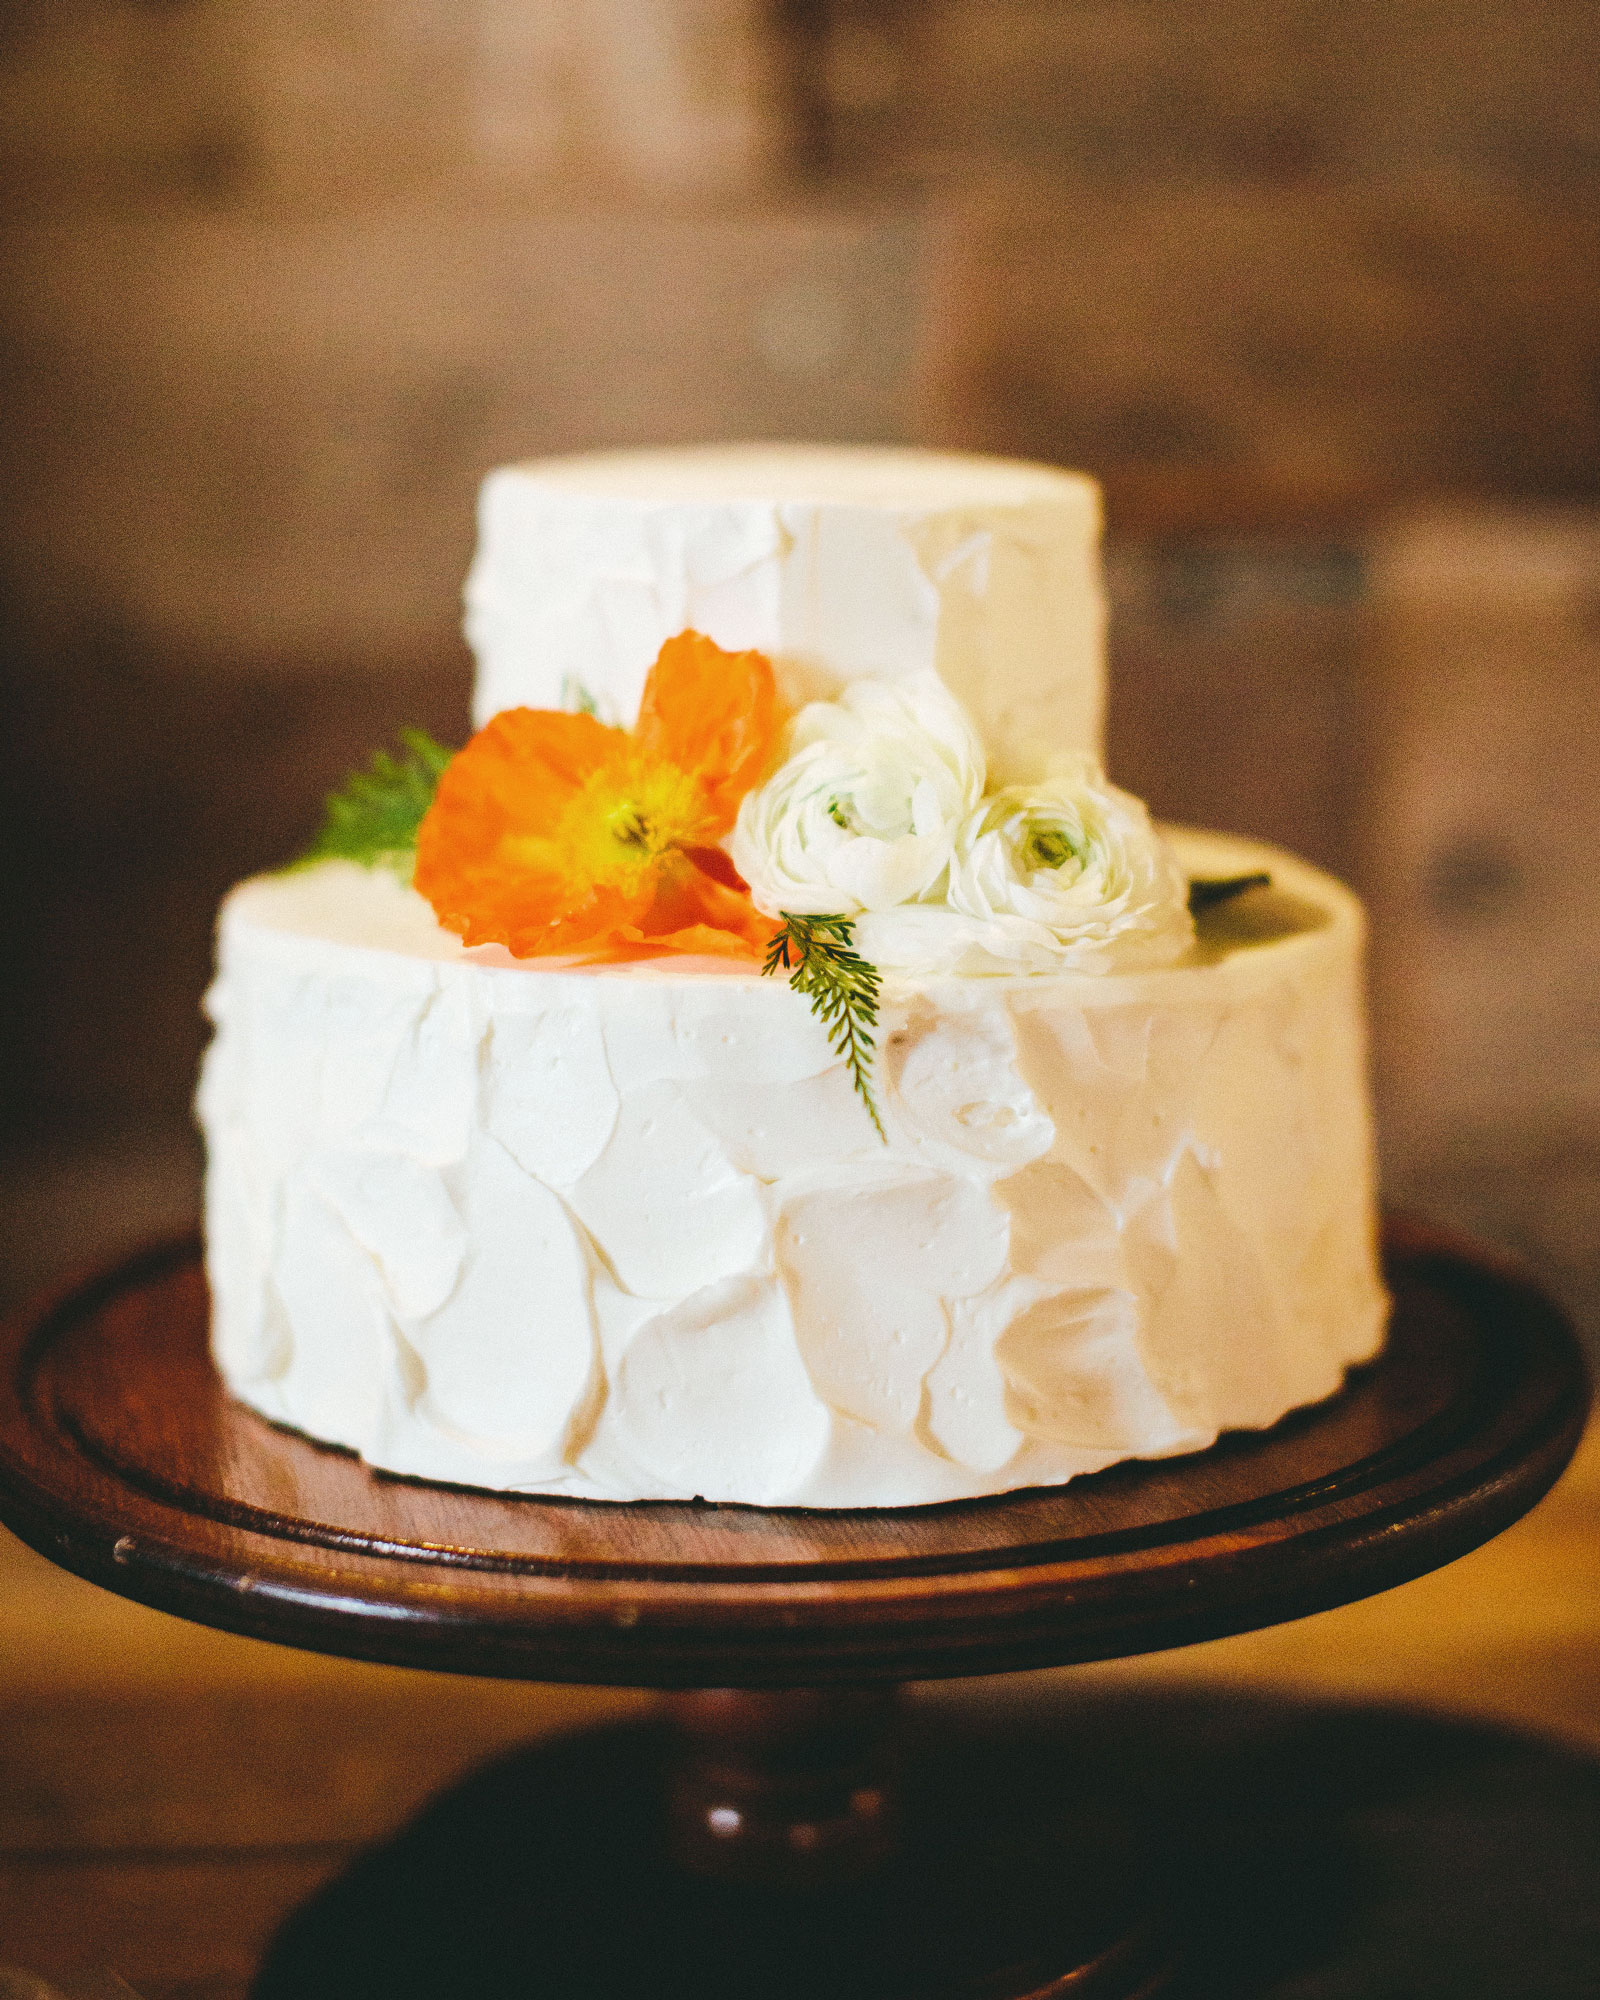 chase-drew-wedding-iowa-cake-232-s112425.jpg